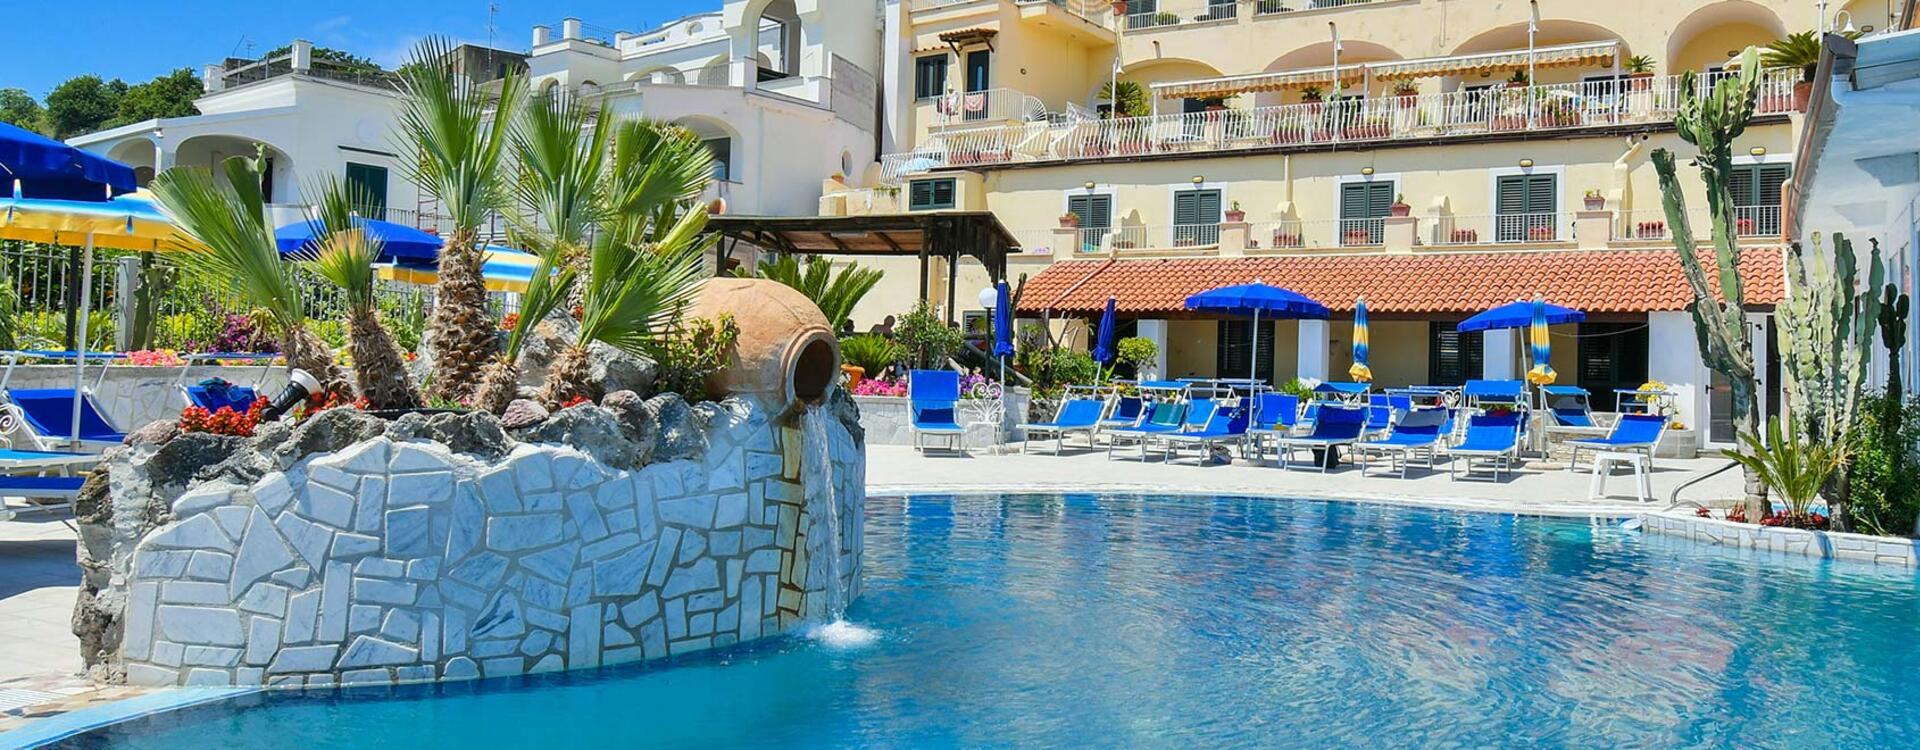 hotelsaintraphaelischia it piscine 010